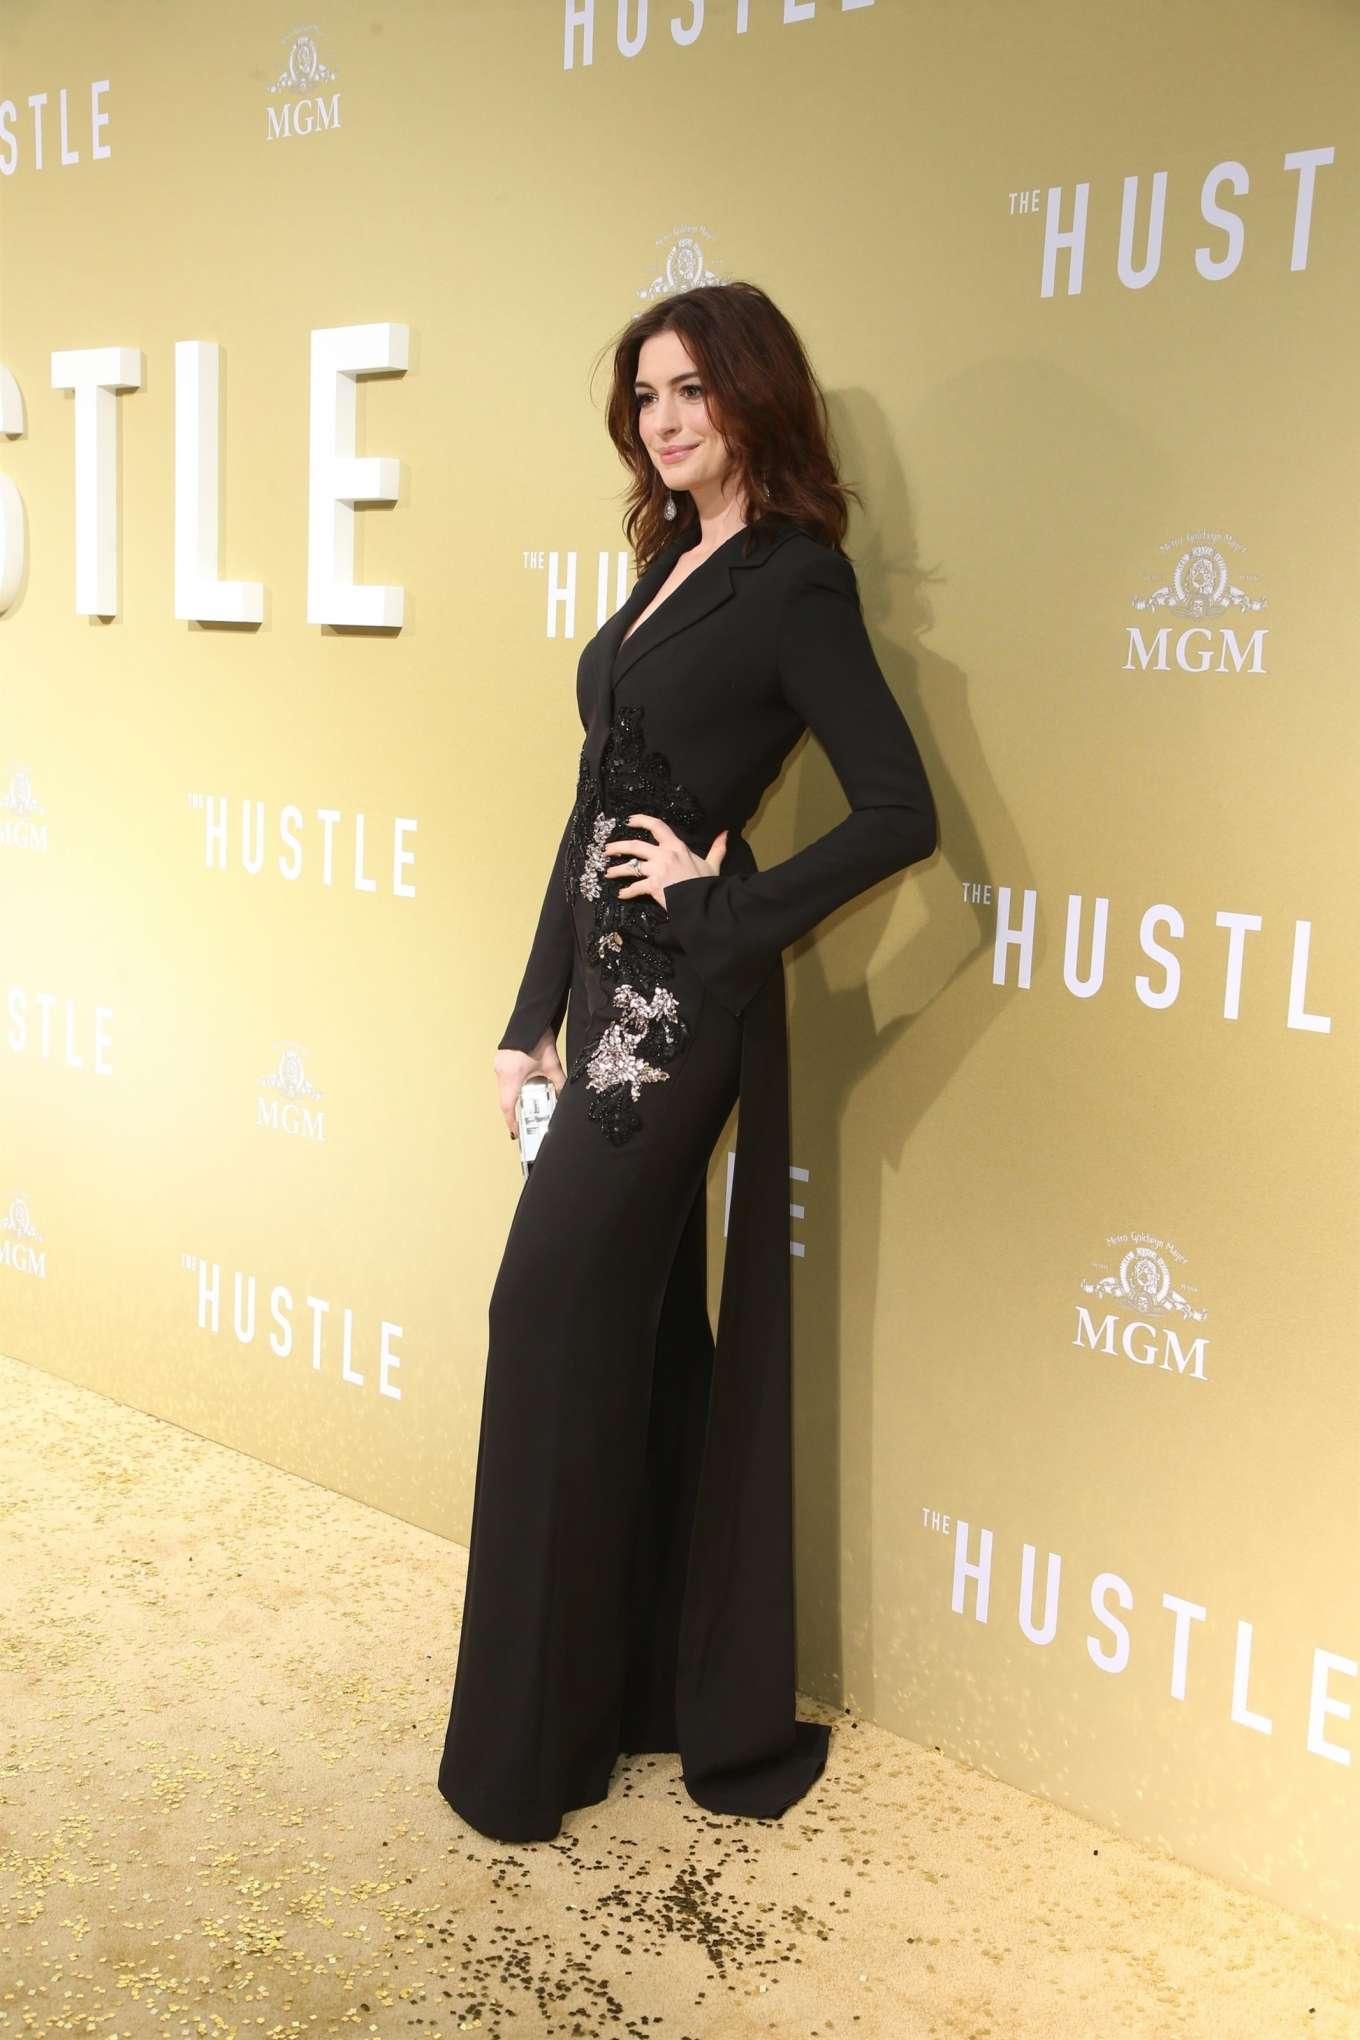 Anne Hathaway 2019 : Anne Hathaway: The Hustle LA Premiere -04